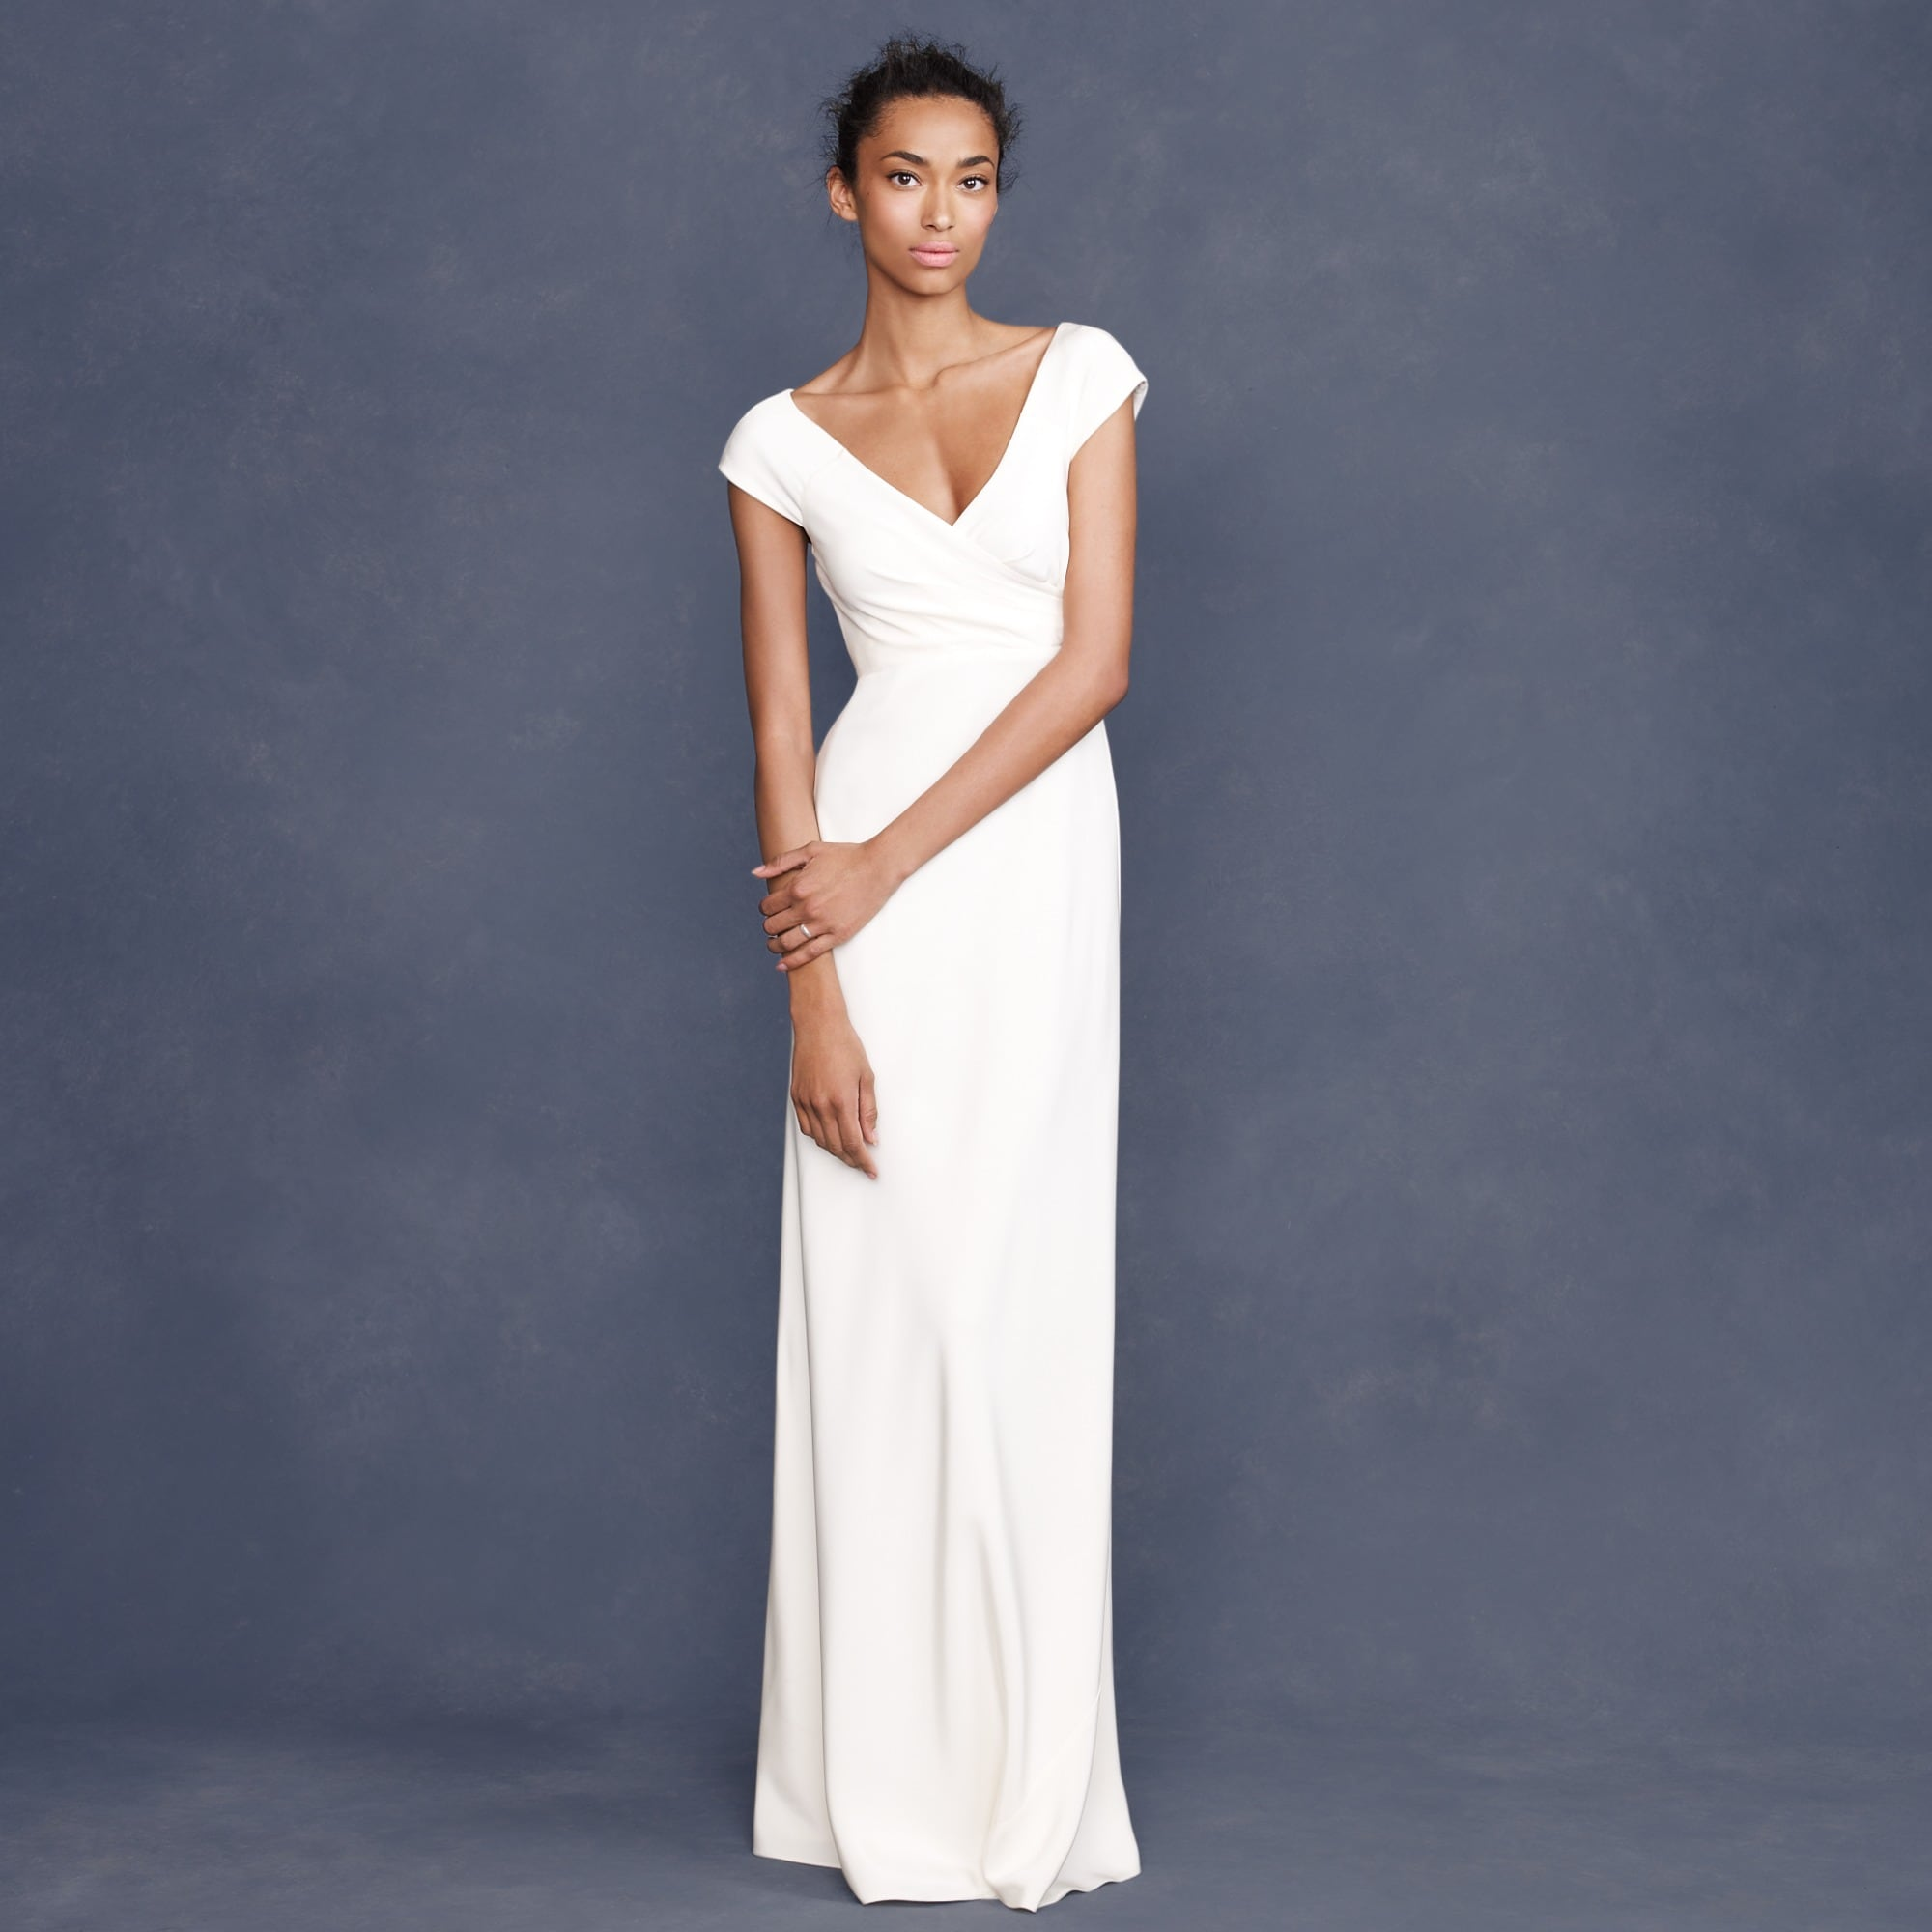 J Crew Wedding Dresses | Dream Wedding IdeaS Around The World